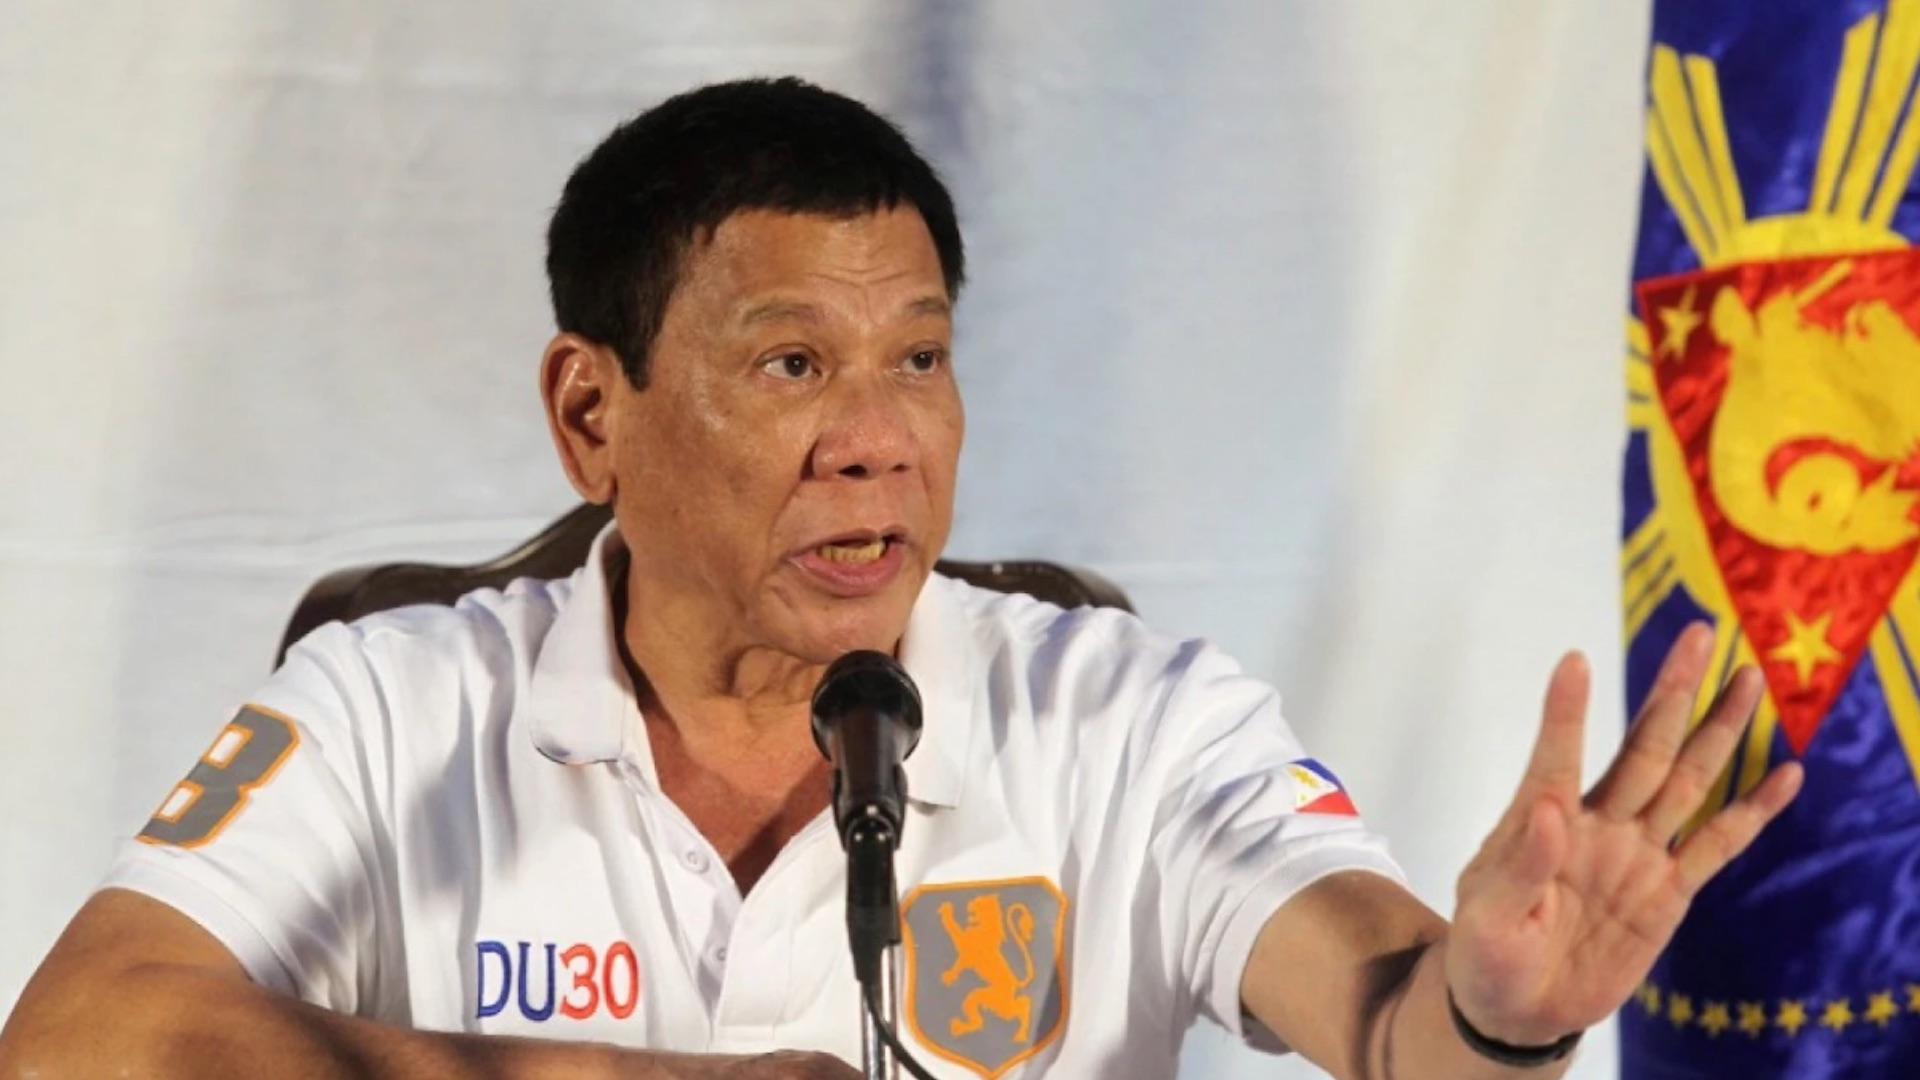 Lo que Duterte prometió a los alcaldes en Vinta golpeó a Lanao del Norte